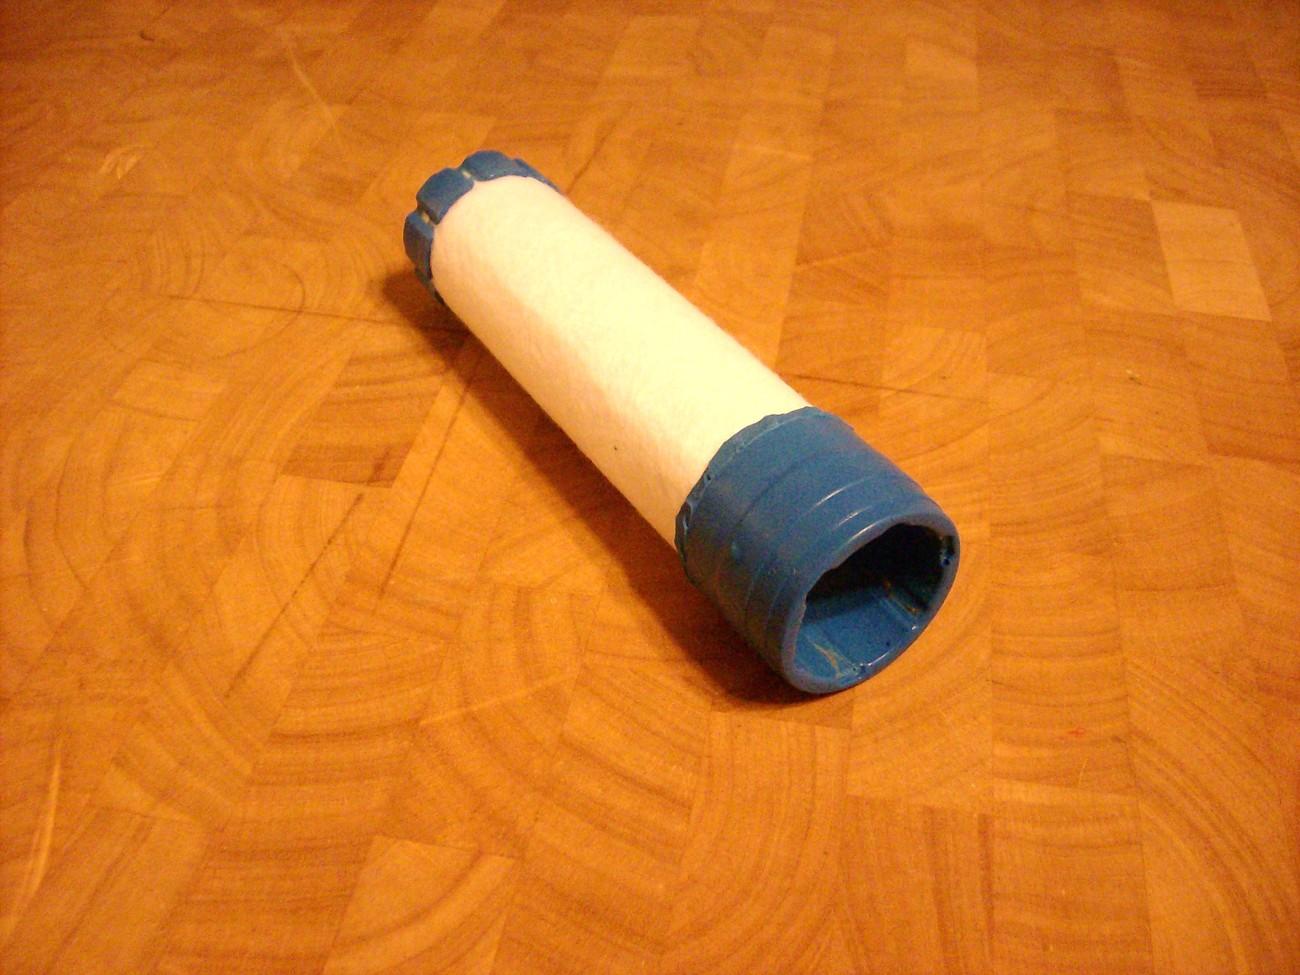 Toro inner air filter 98-2982, 982982